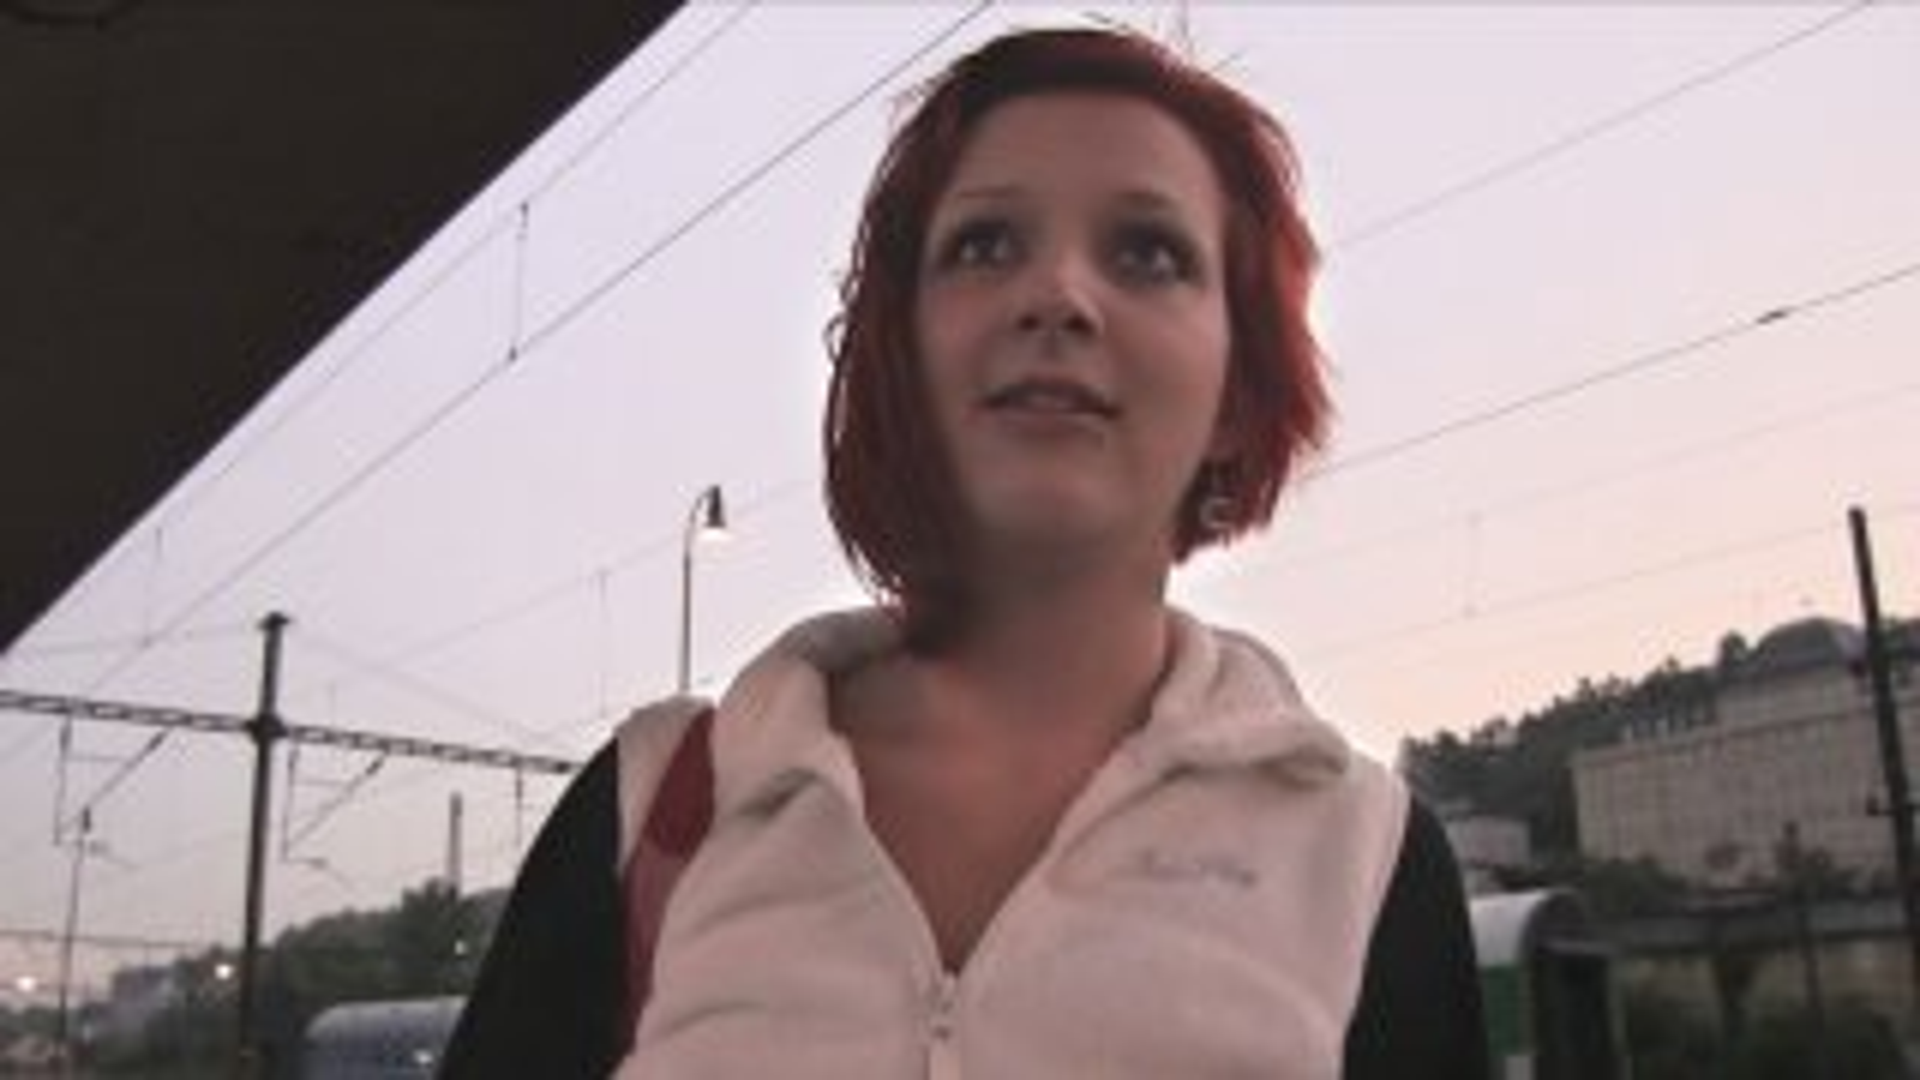 Redhead Gives Sloppy Blowjob And Fucks Stranger - Public Agent